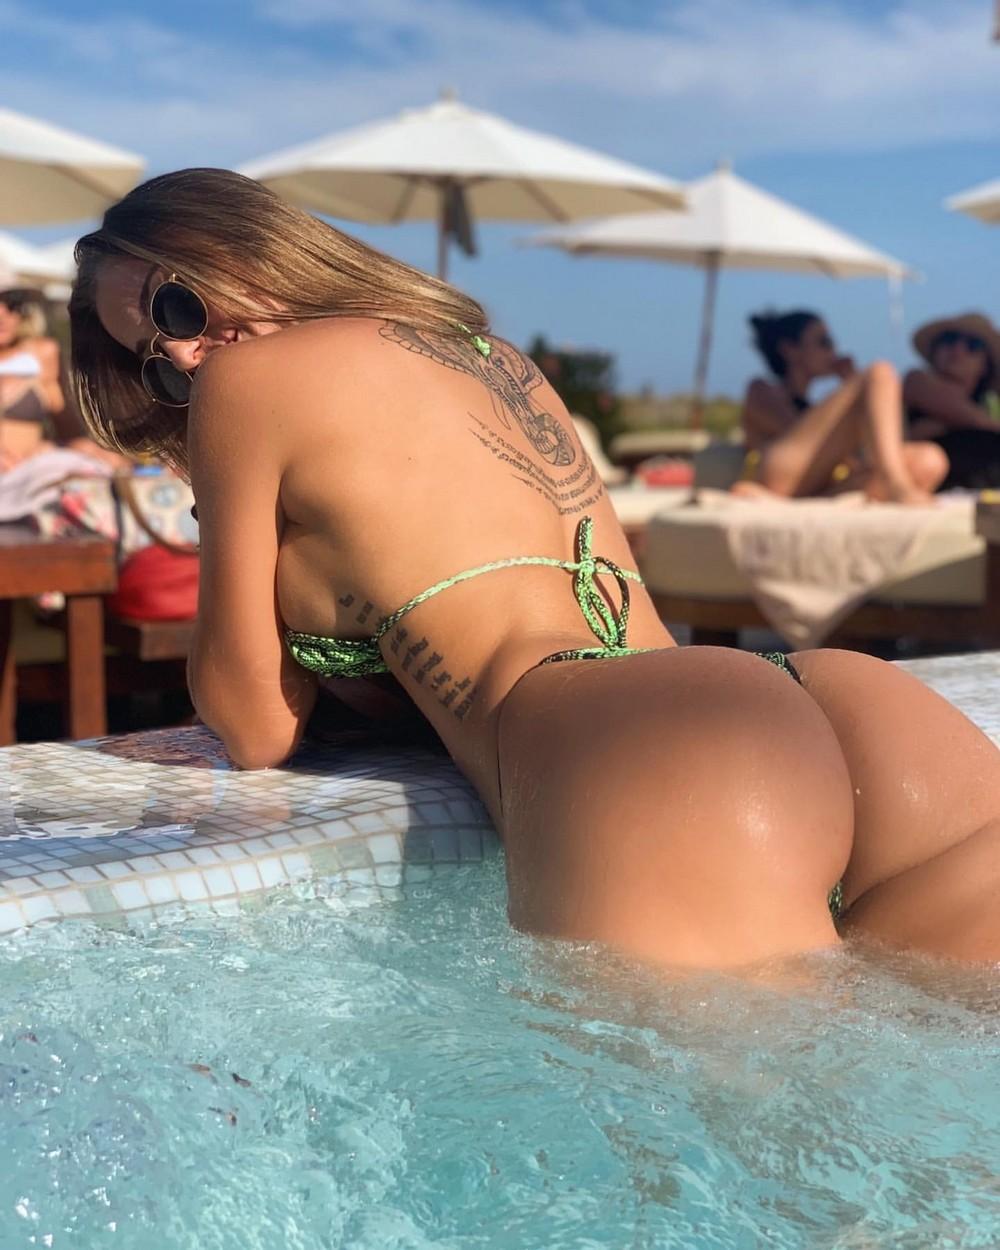 Девушки выгибают спинку картинки,позитив